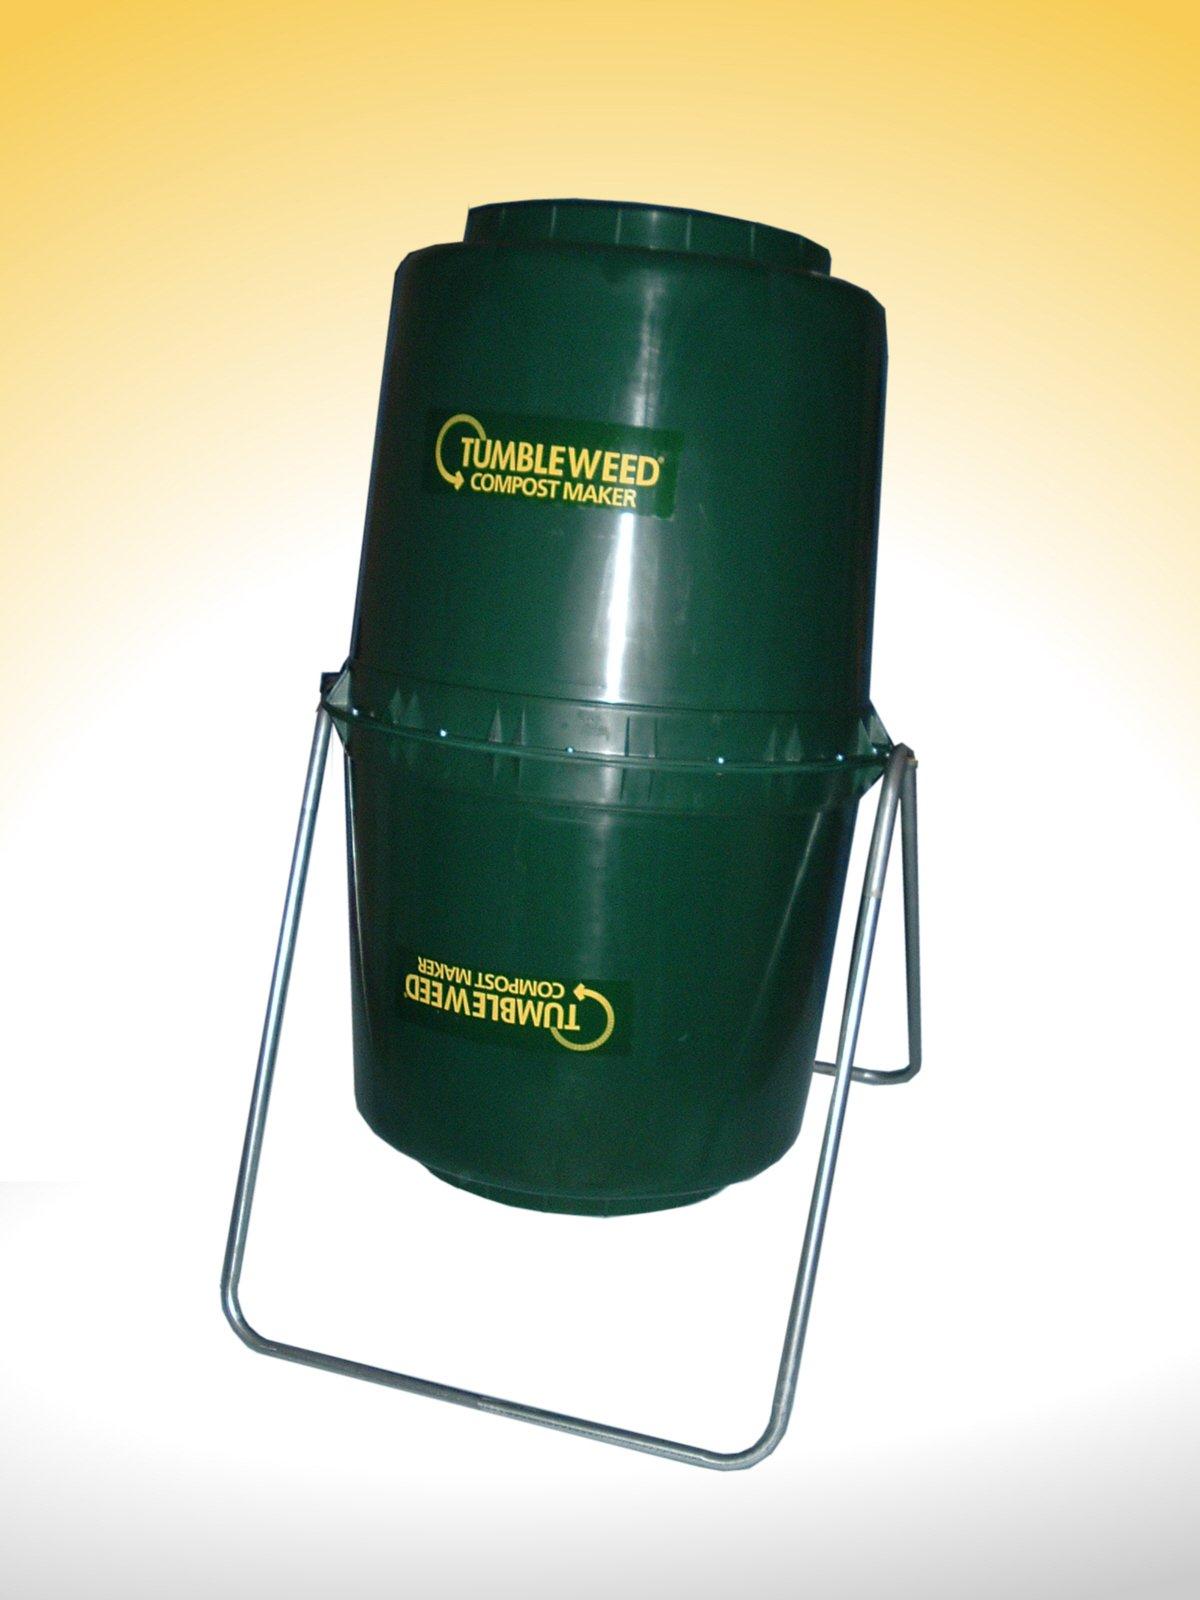 tumbleweed compost tumbler instructions manual